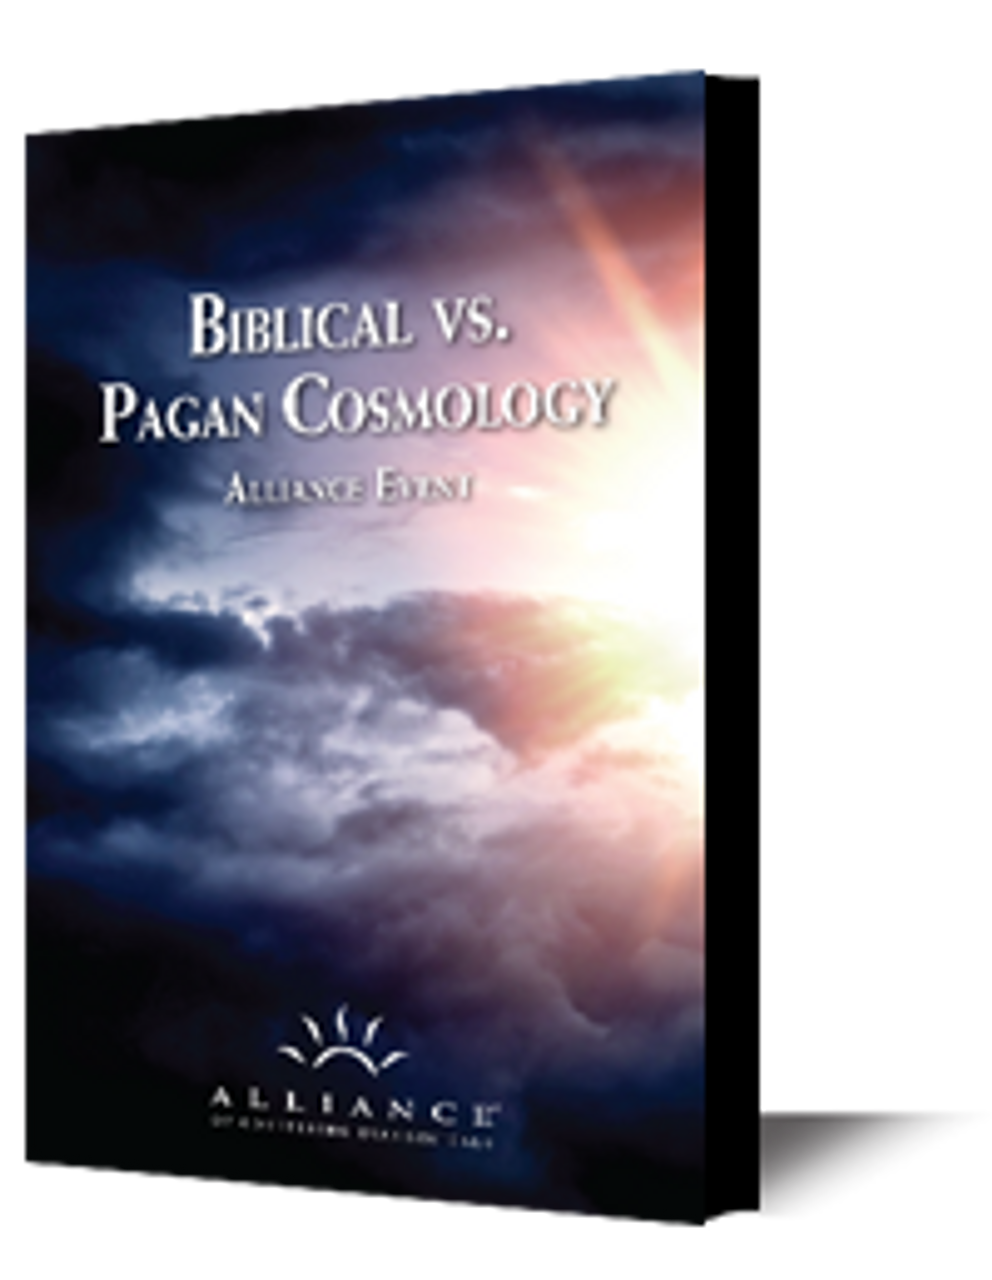 Biblical vs. Pagan Cosmology (CD Set)